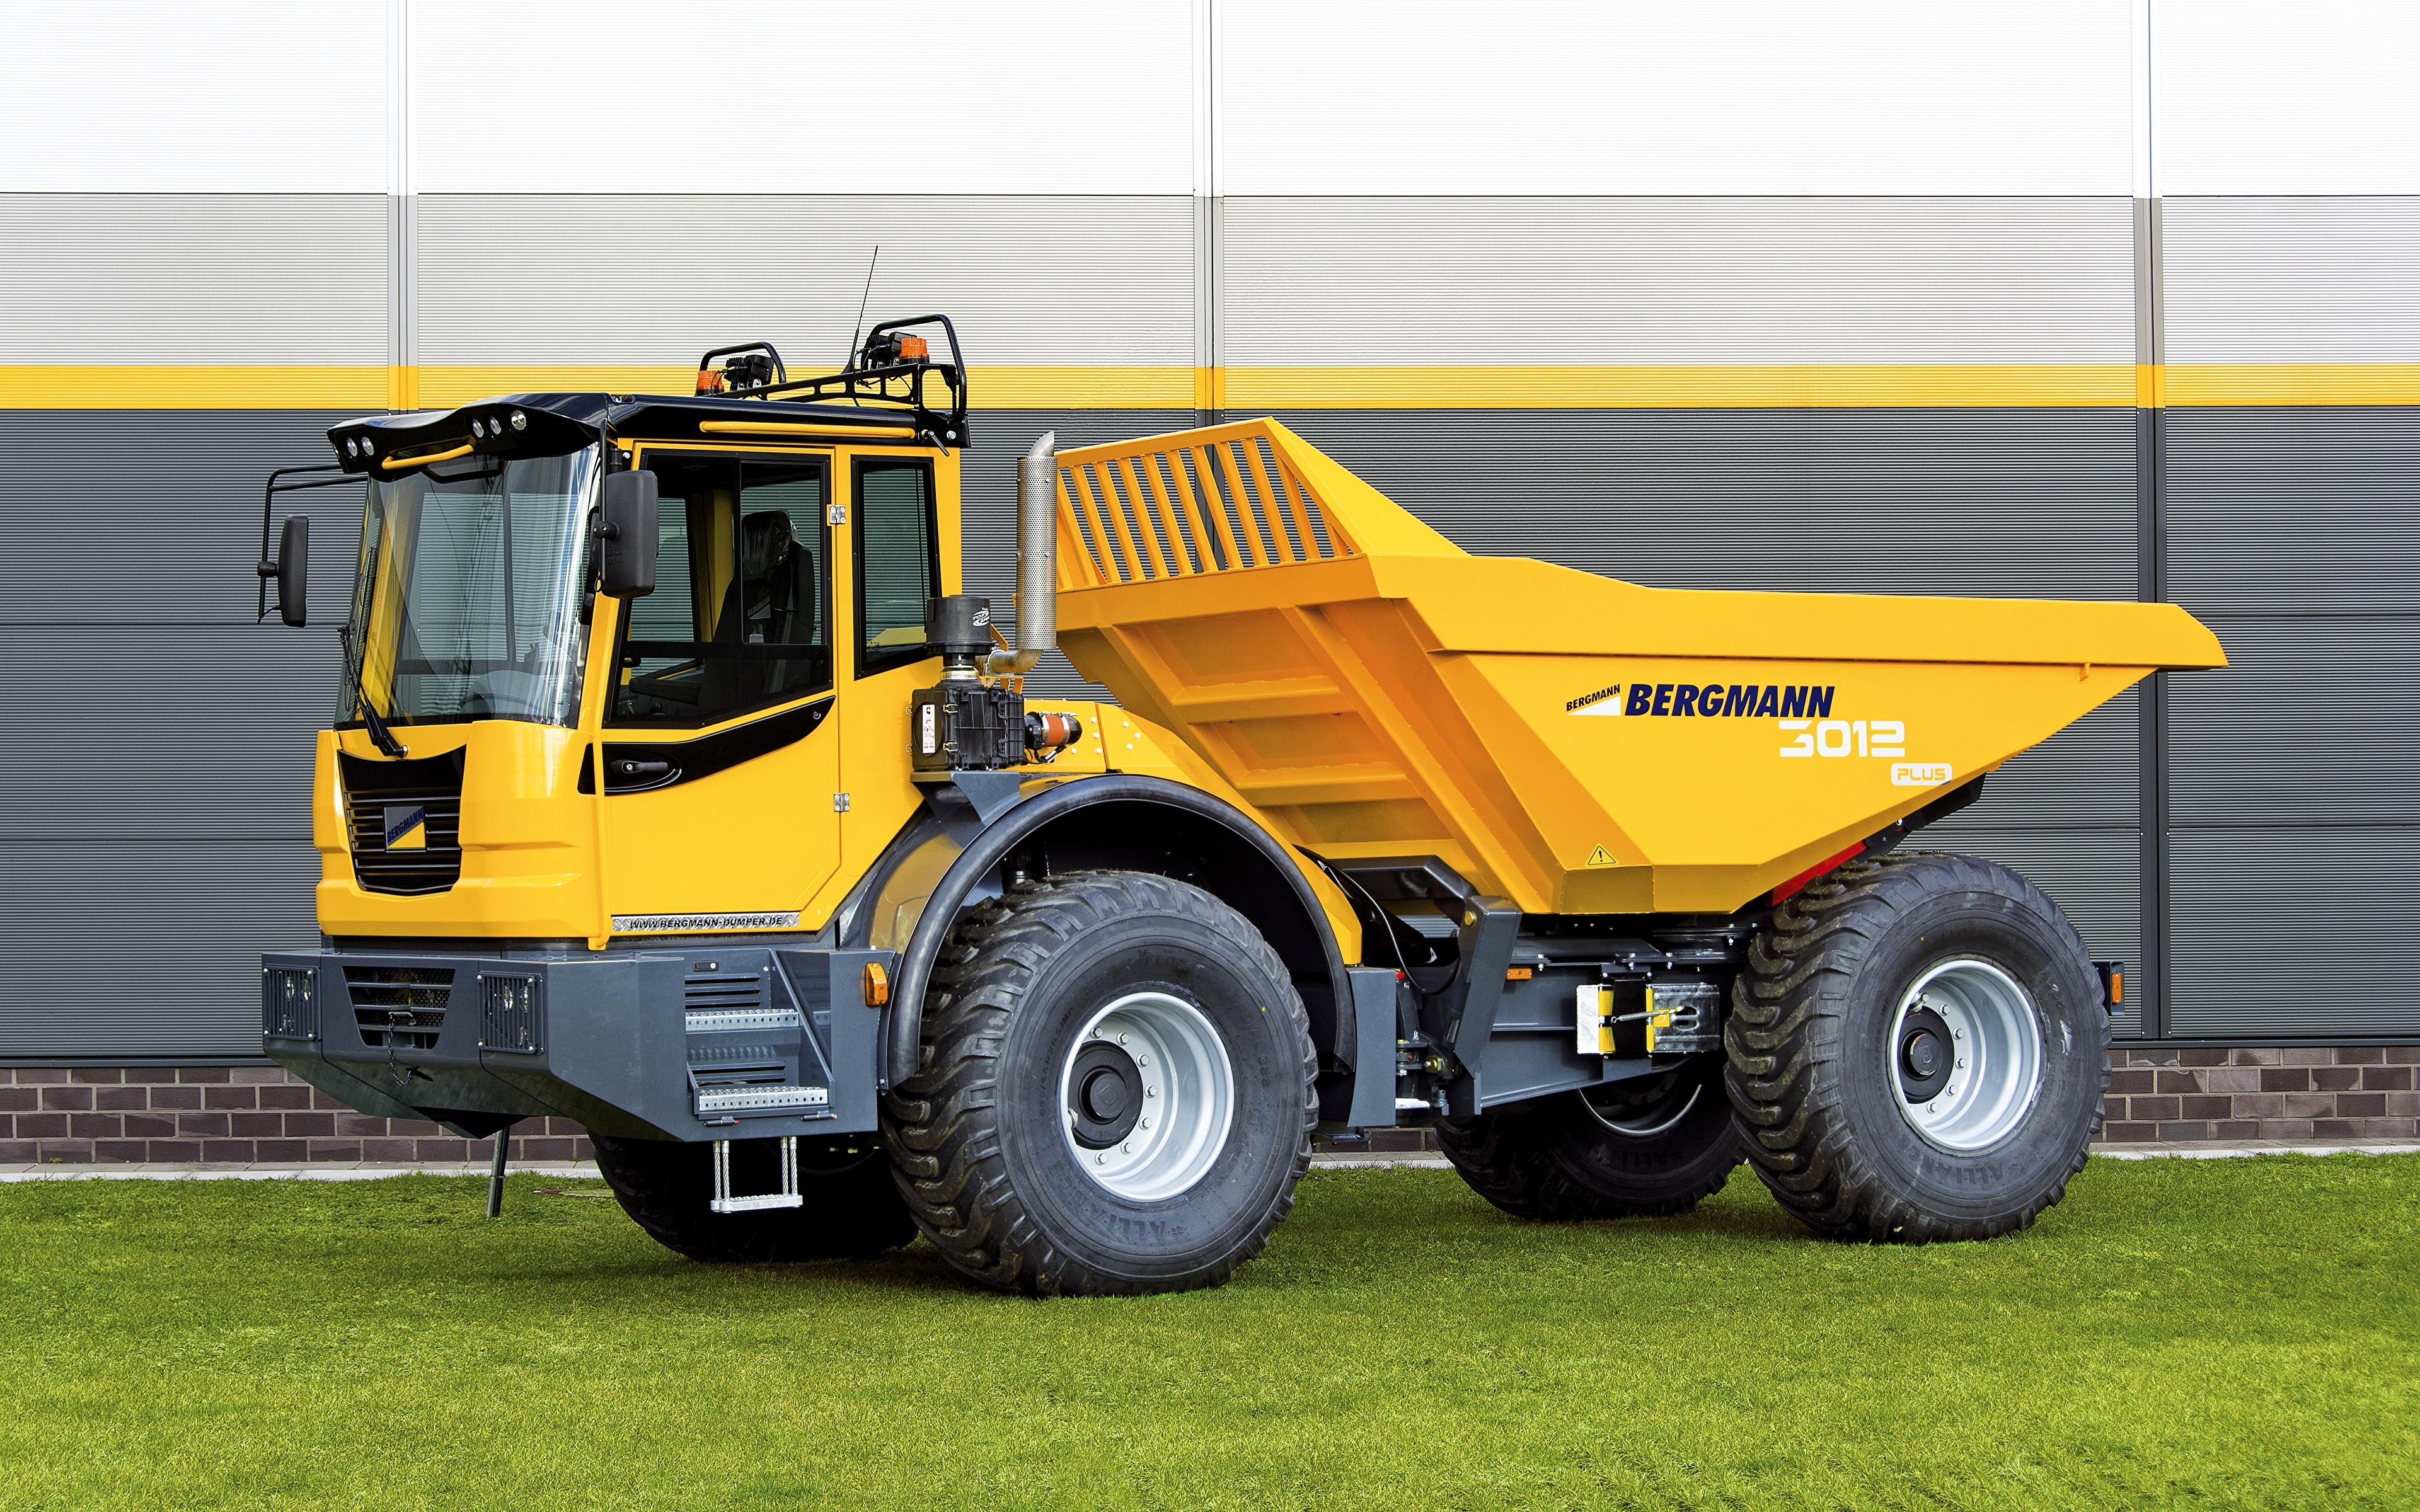 Pictures lorry 2016-17 Bergmann 3012 R PLUS Yellow Cars 3840x2400 Trucks auto automobile